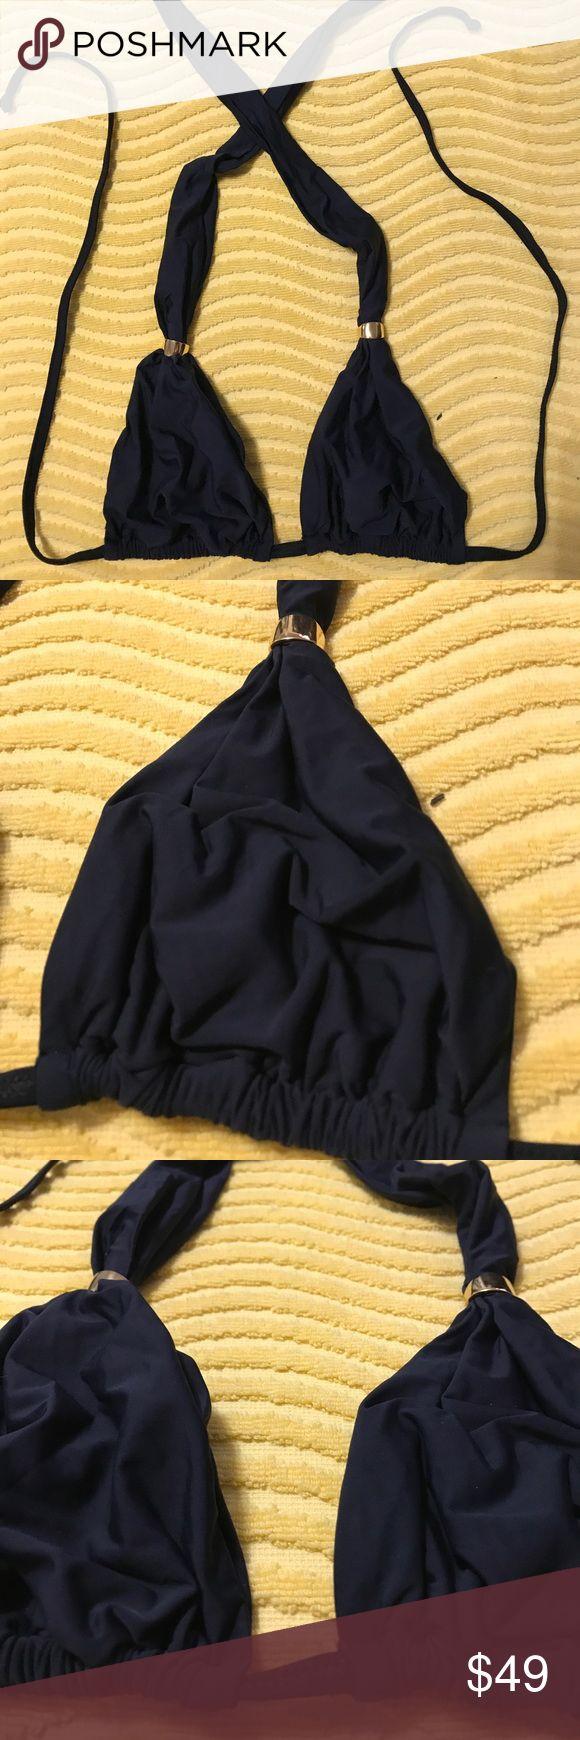 Ipanema Black Triangle Bikini Top Excellent condition. Ipanema Swim Bikinis